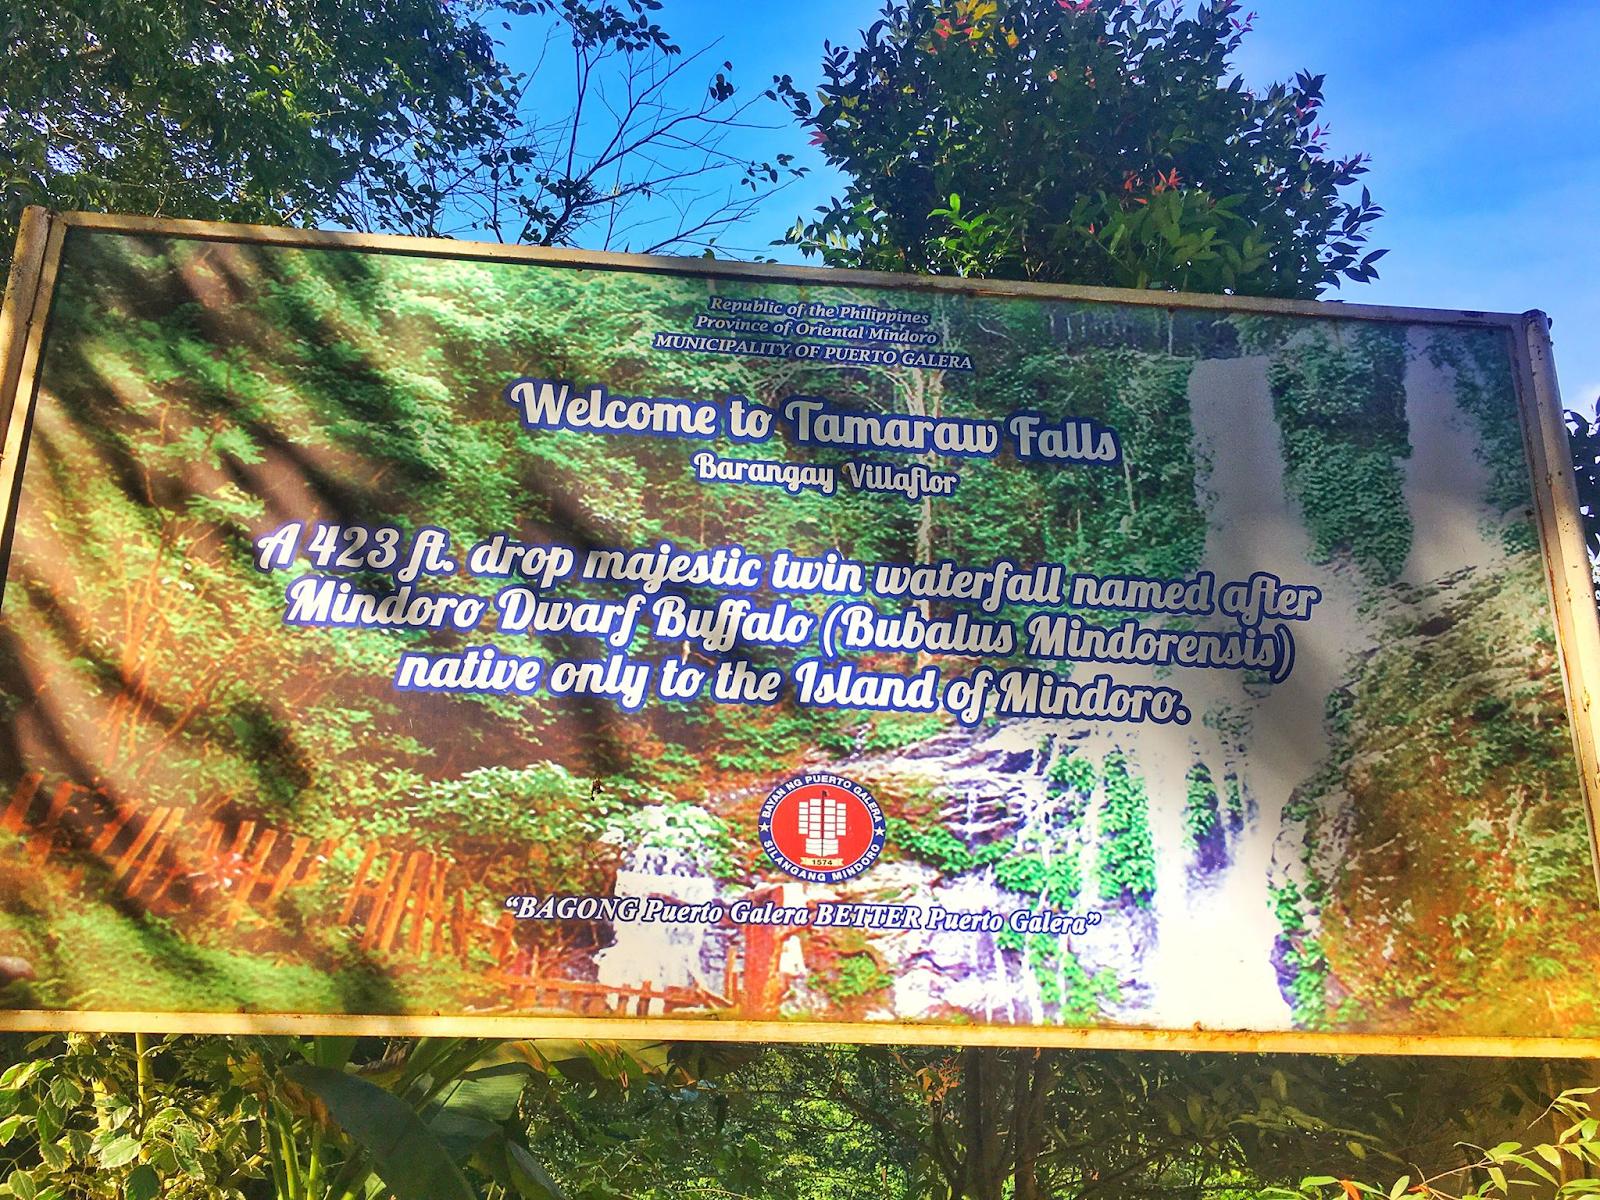 TAMARAO FALLS ENTRANCE FEE